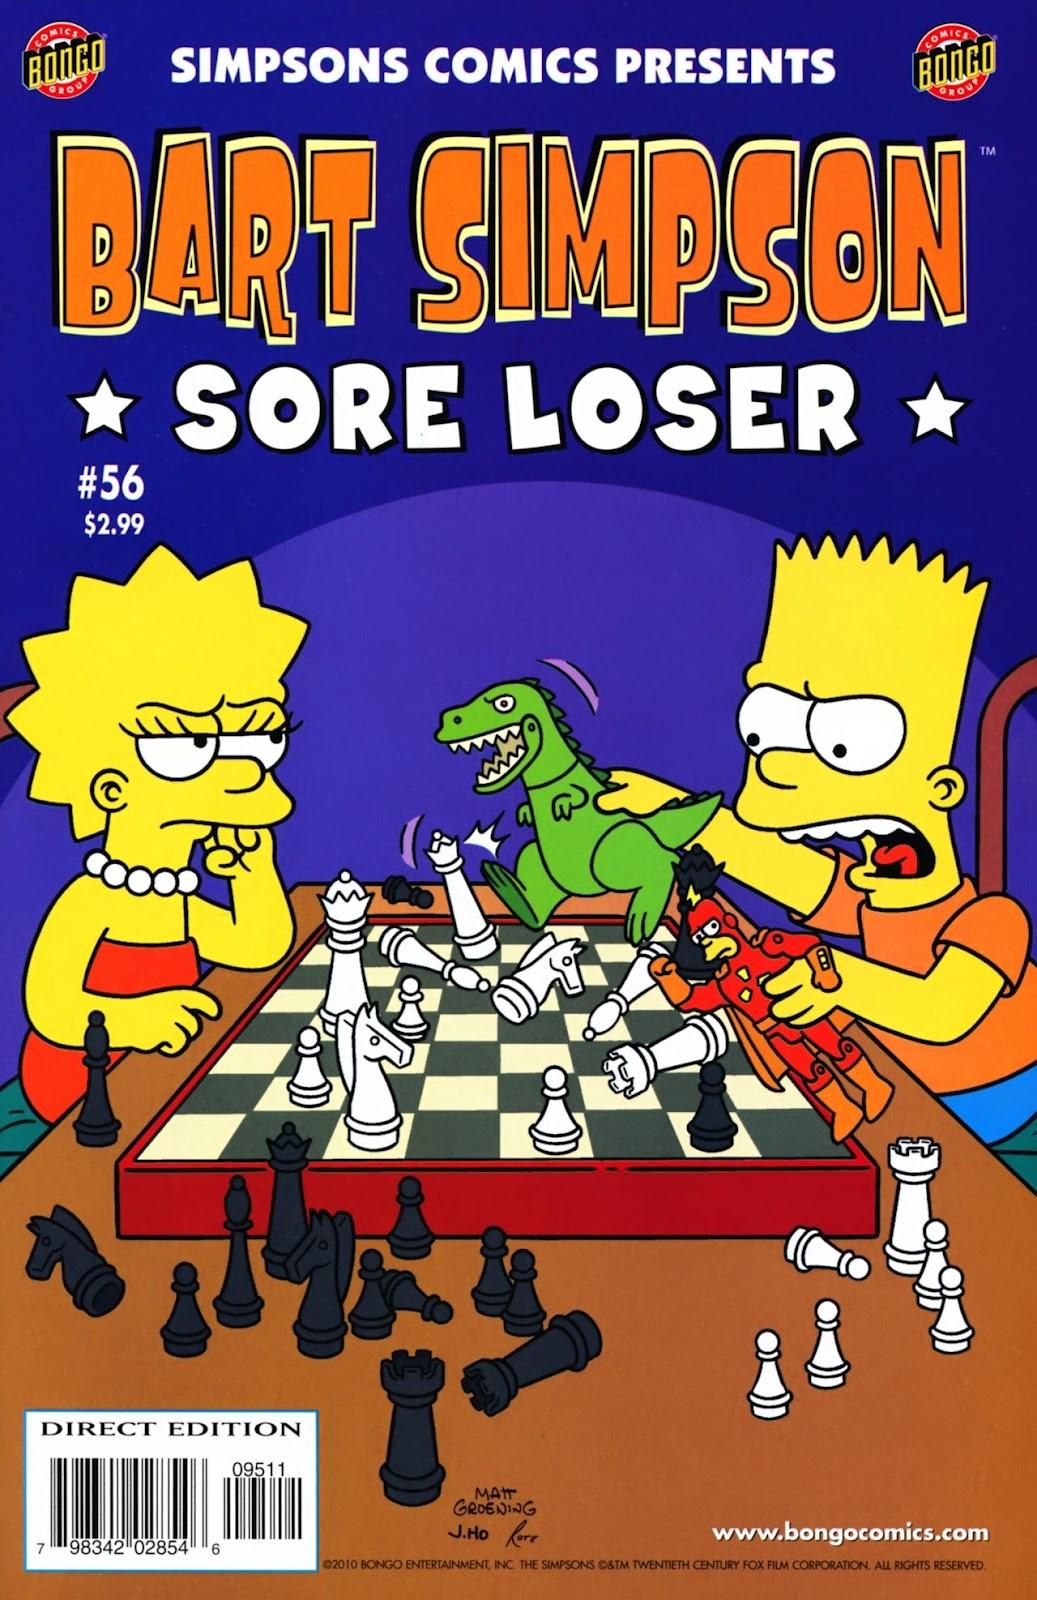 Simpsons Comics Presents Bart Simpson 56 Page 1